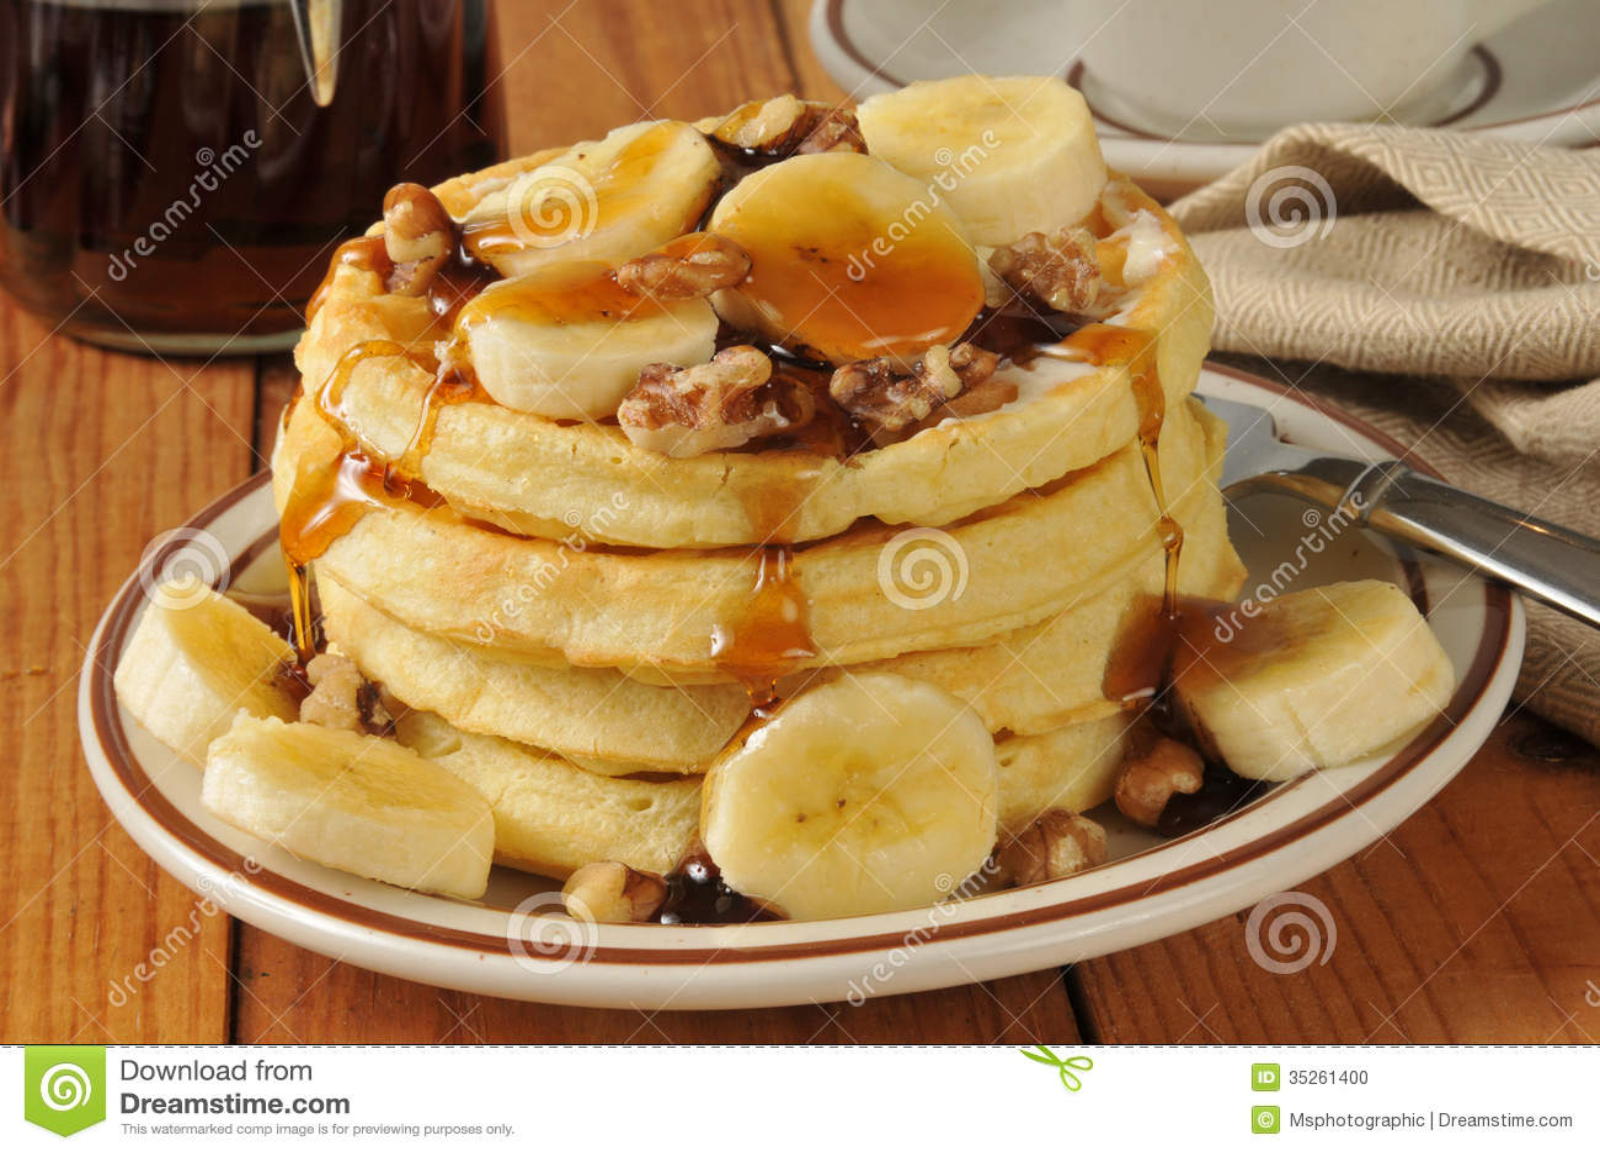 Maple Walnut Waffles Recipe — Dishmaps